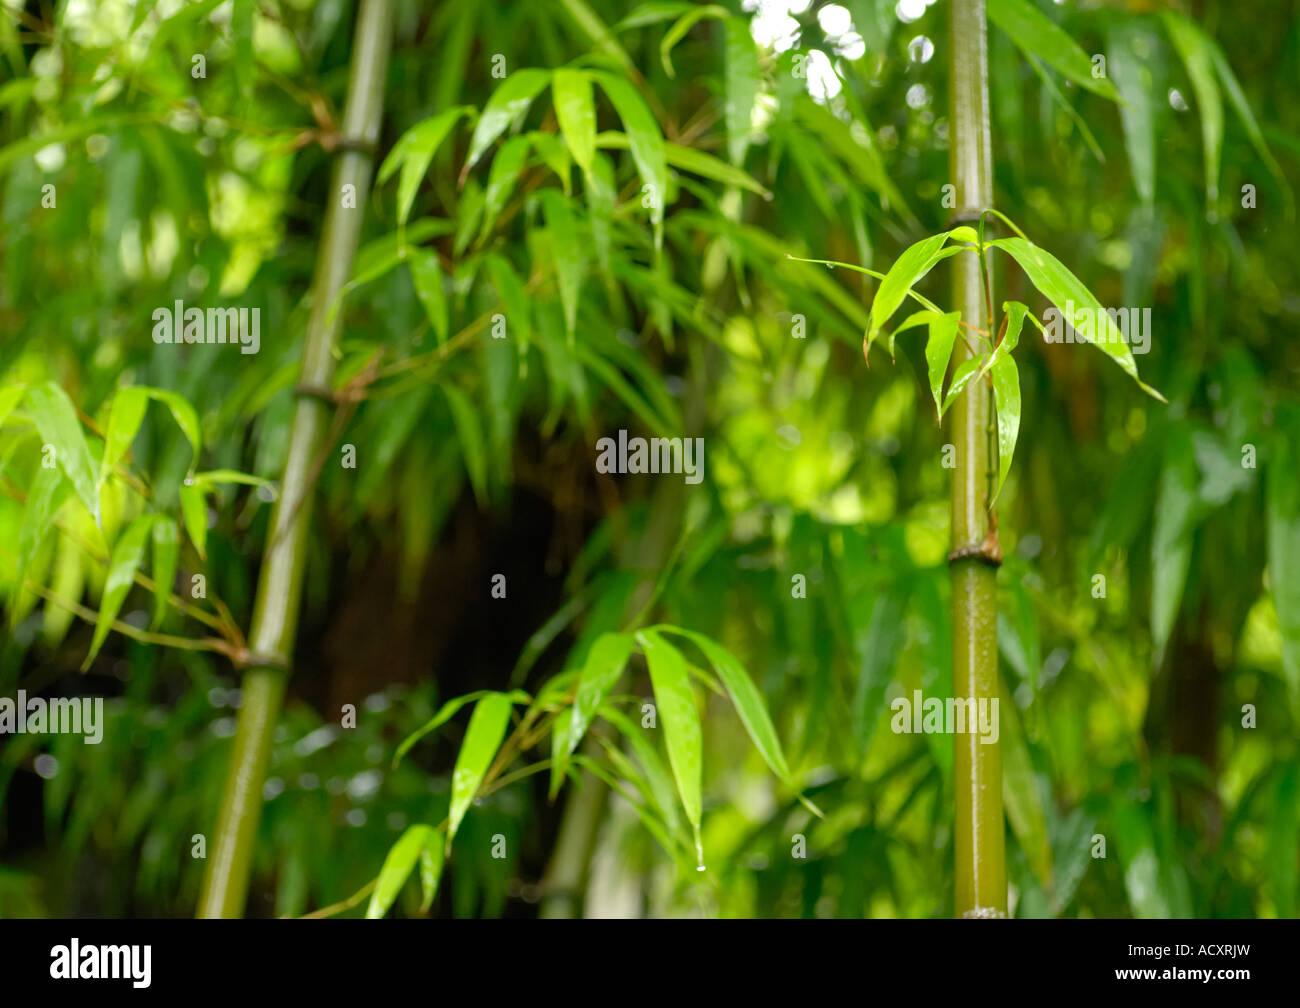 Sankai En japanischer Garten Bambus Stockfoto, Bild: 13248144 - Alamy